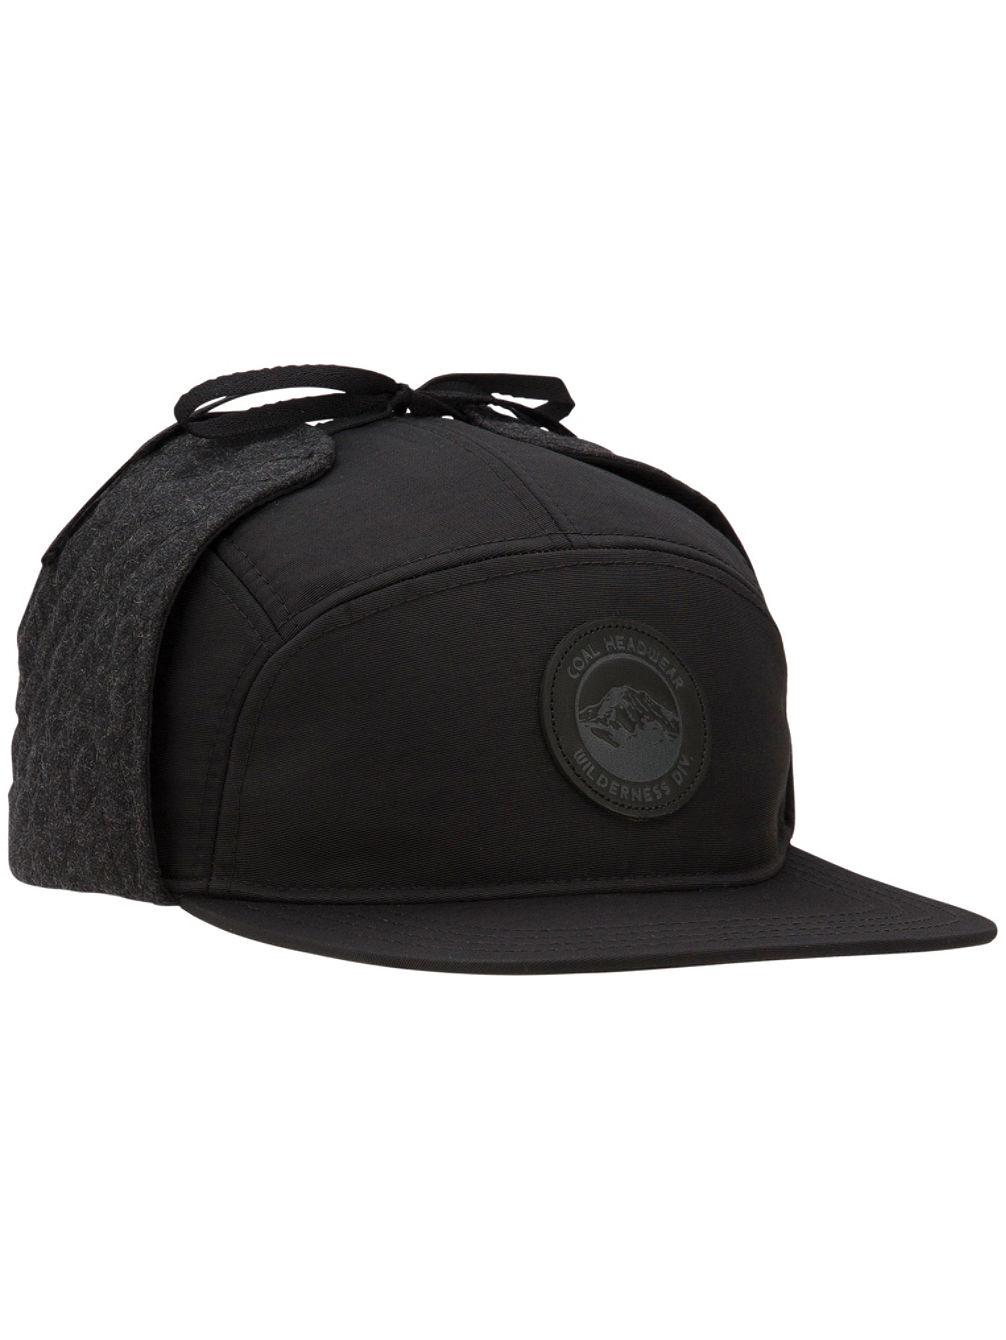 the-tracker-cap